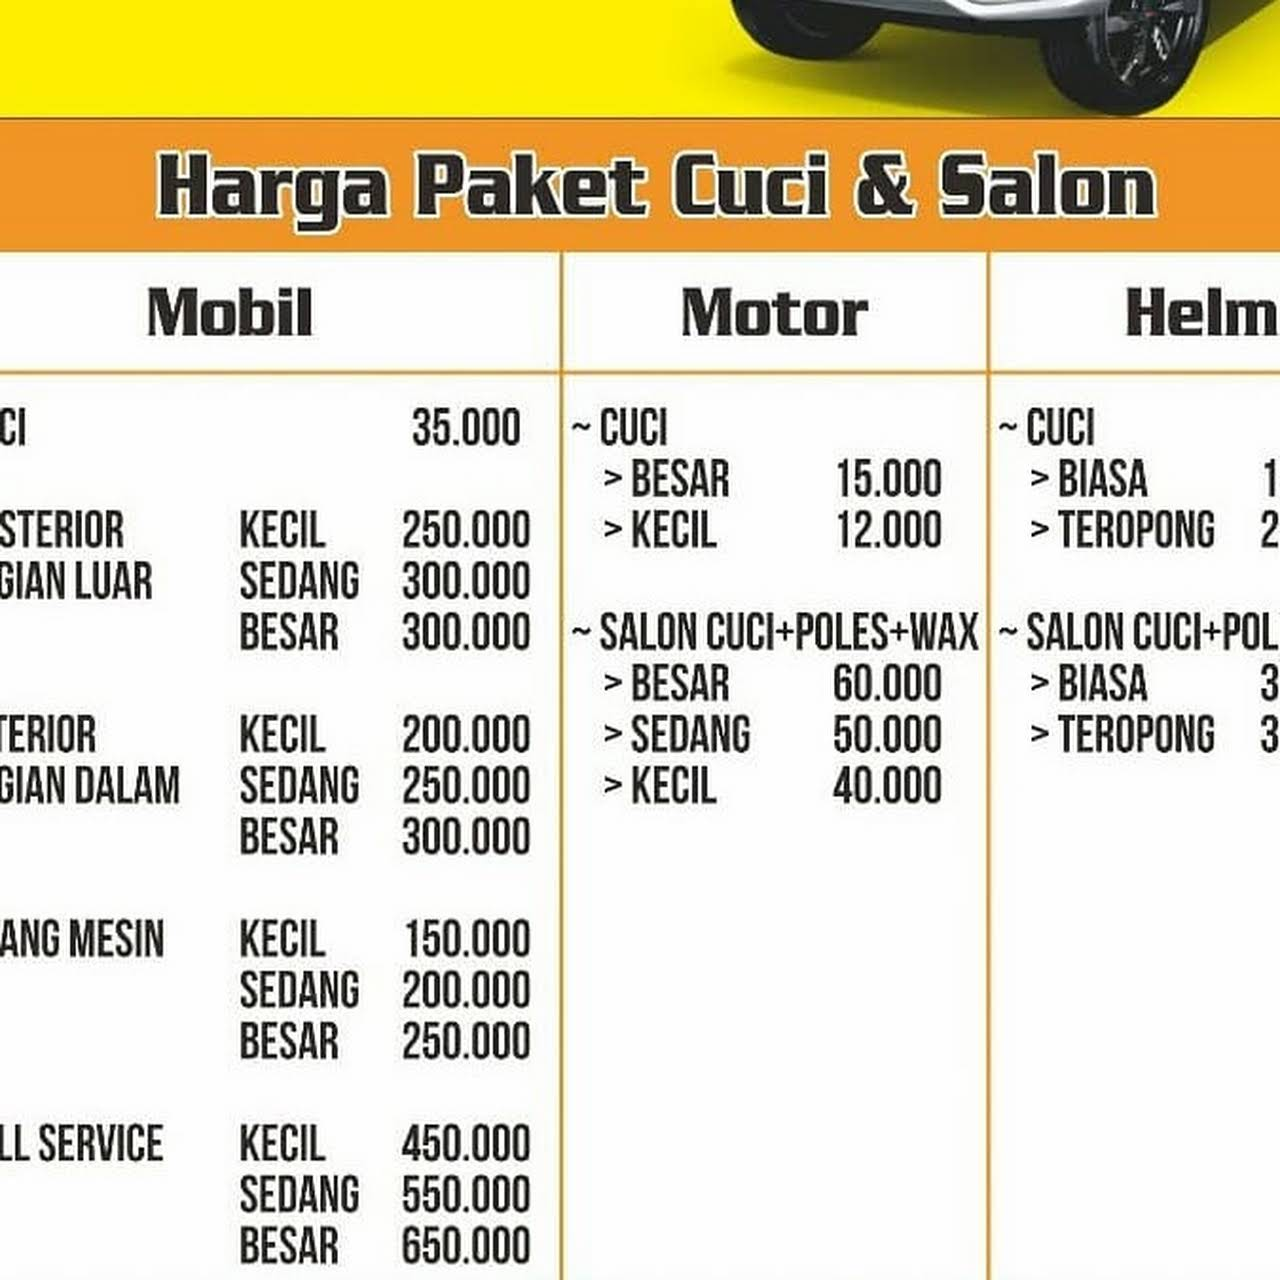 Vip 2 Cuci Salon Mobil Motor Helm Tempat Pencucian Mobil Dan Motor